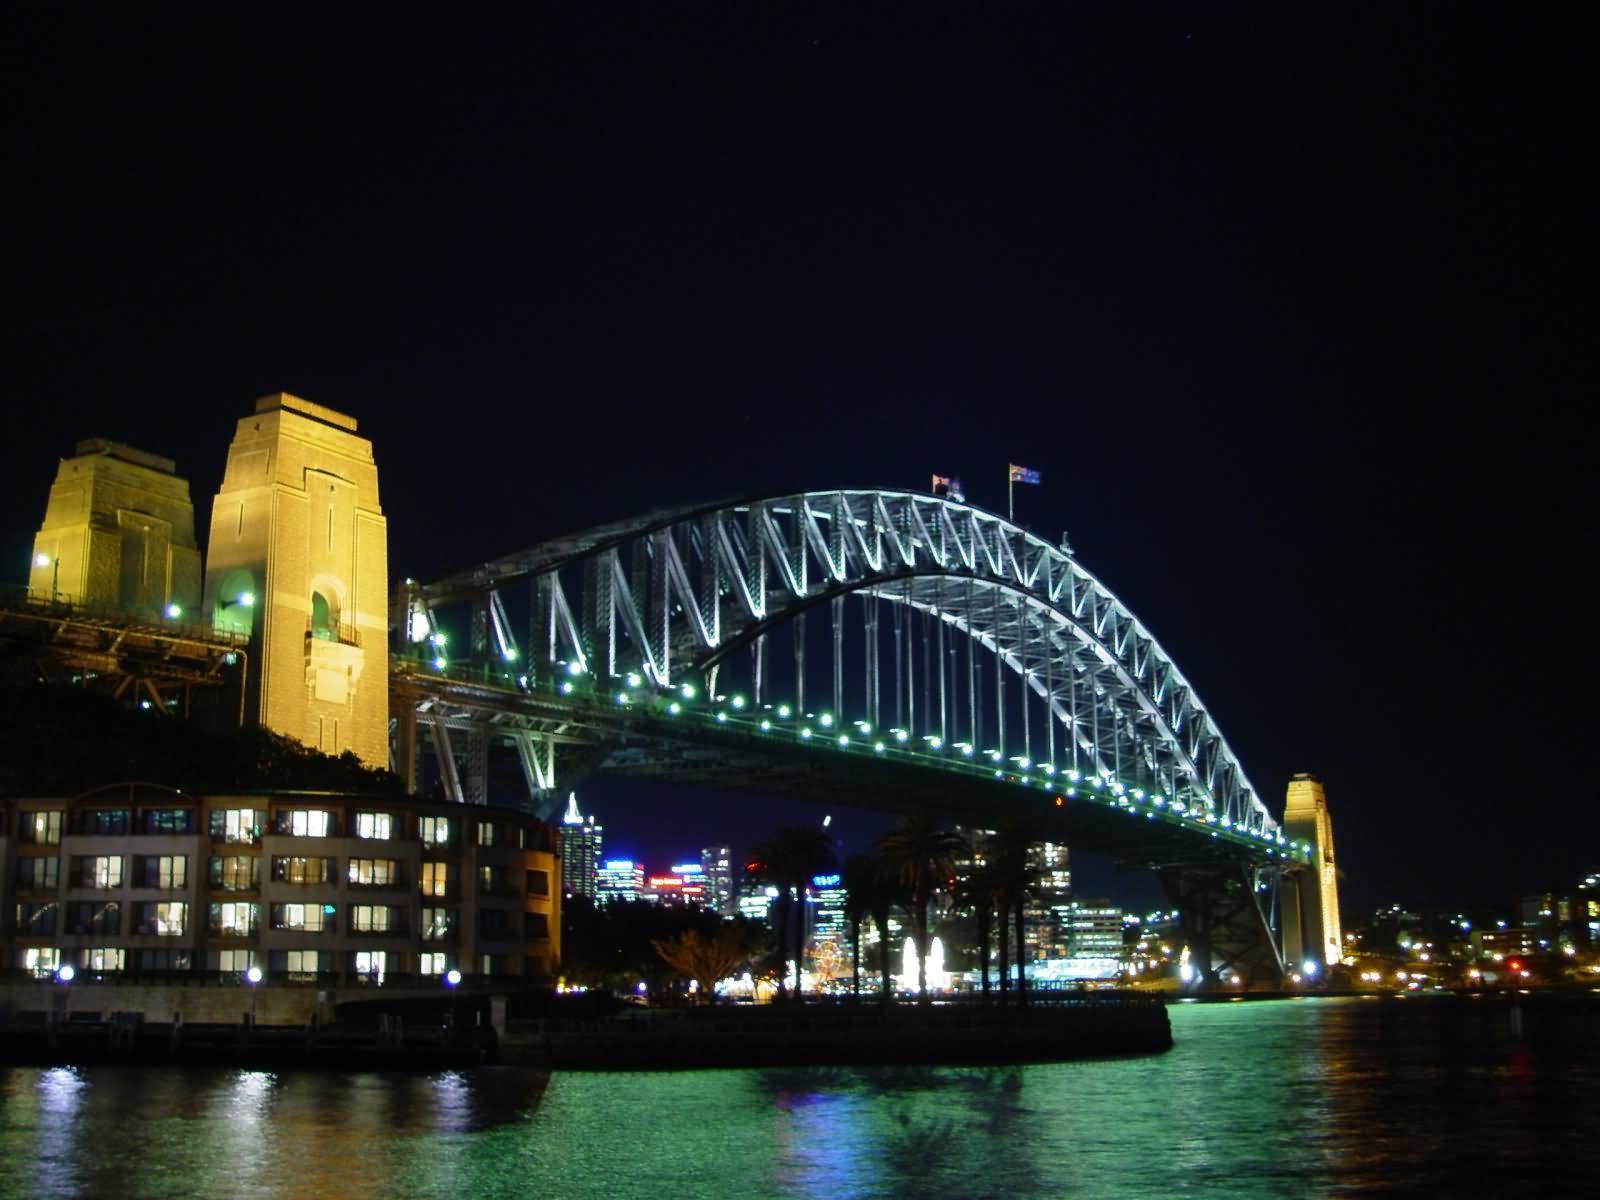 Sydney harbour bridge wallpapers travel hd wallpapers wallpapers sydney harbour bridge wallpapers travel hd wallpapers altavistaventures Choice Image